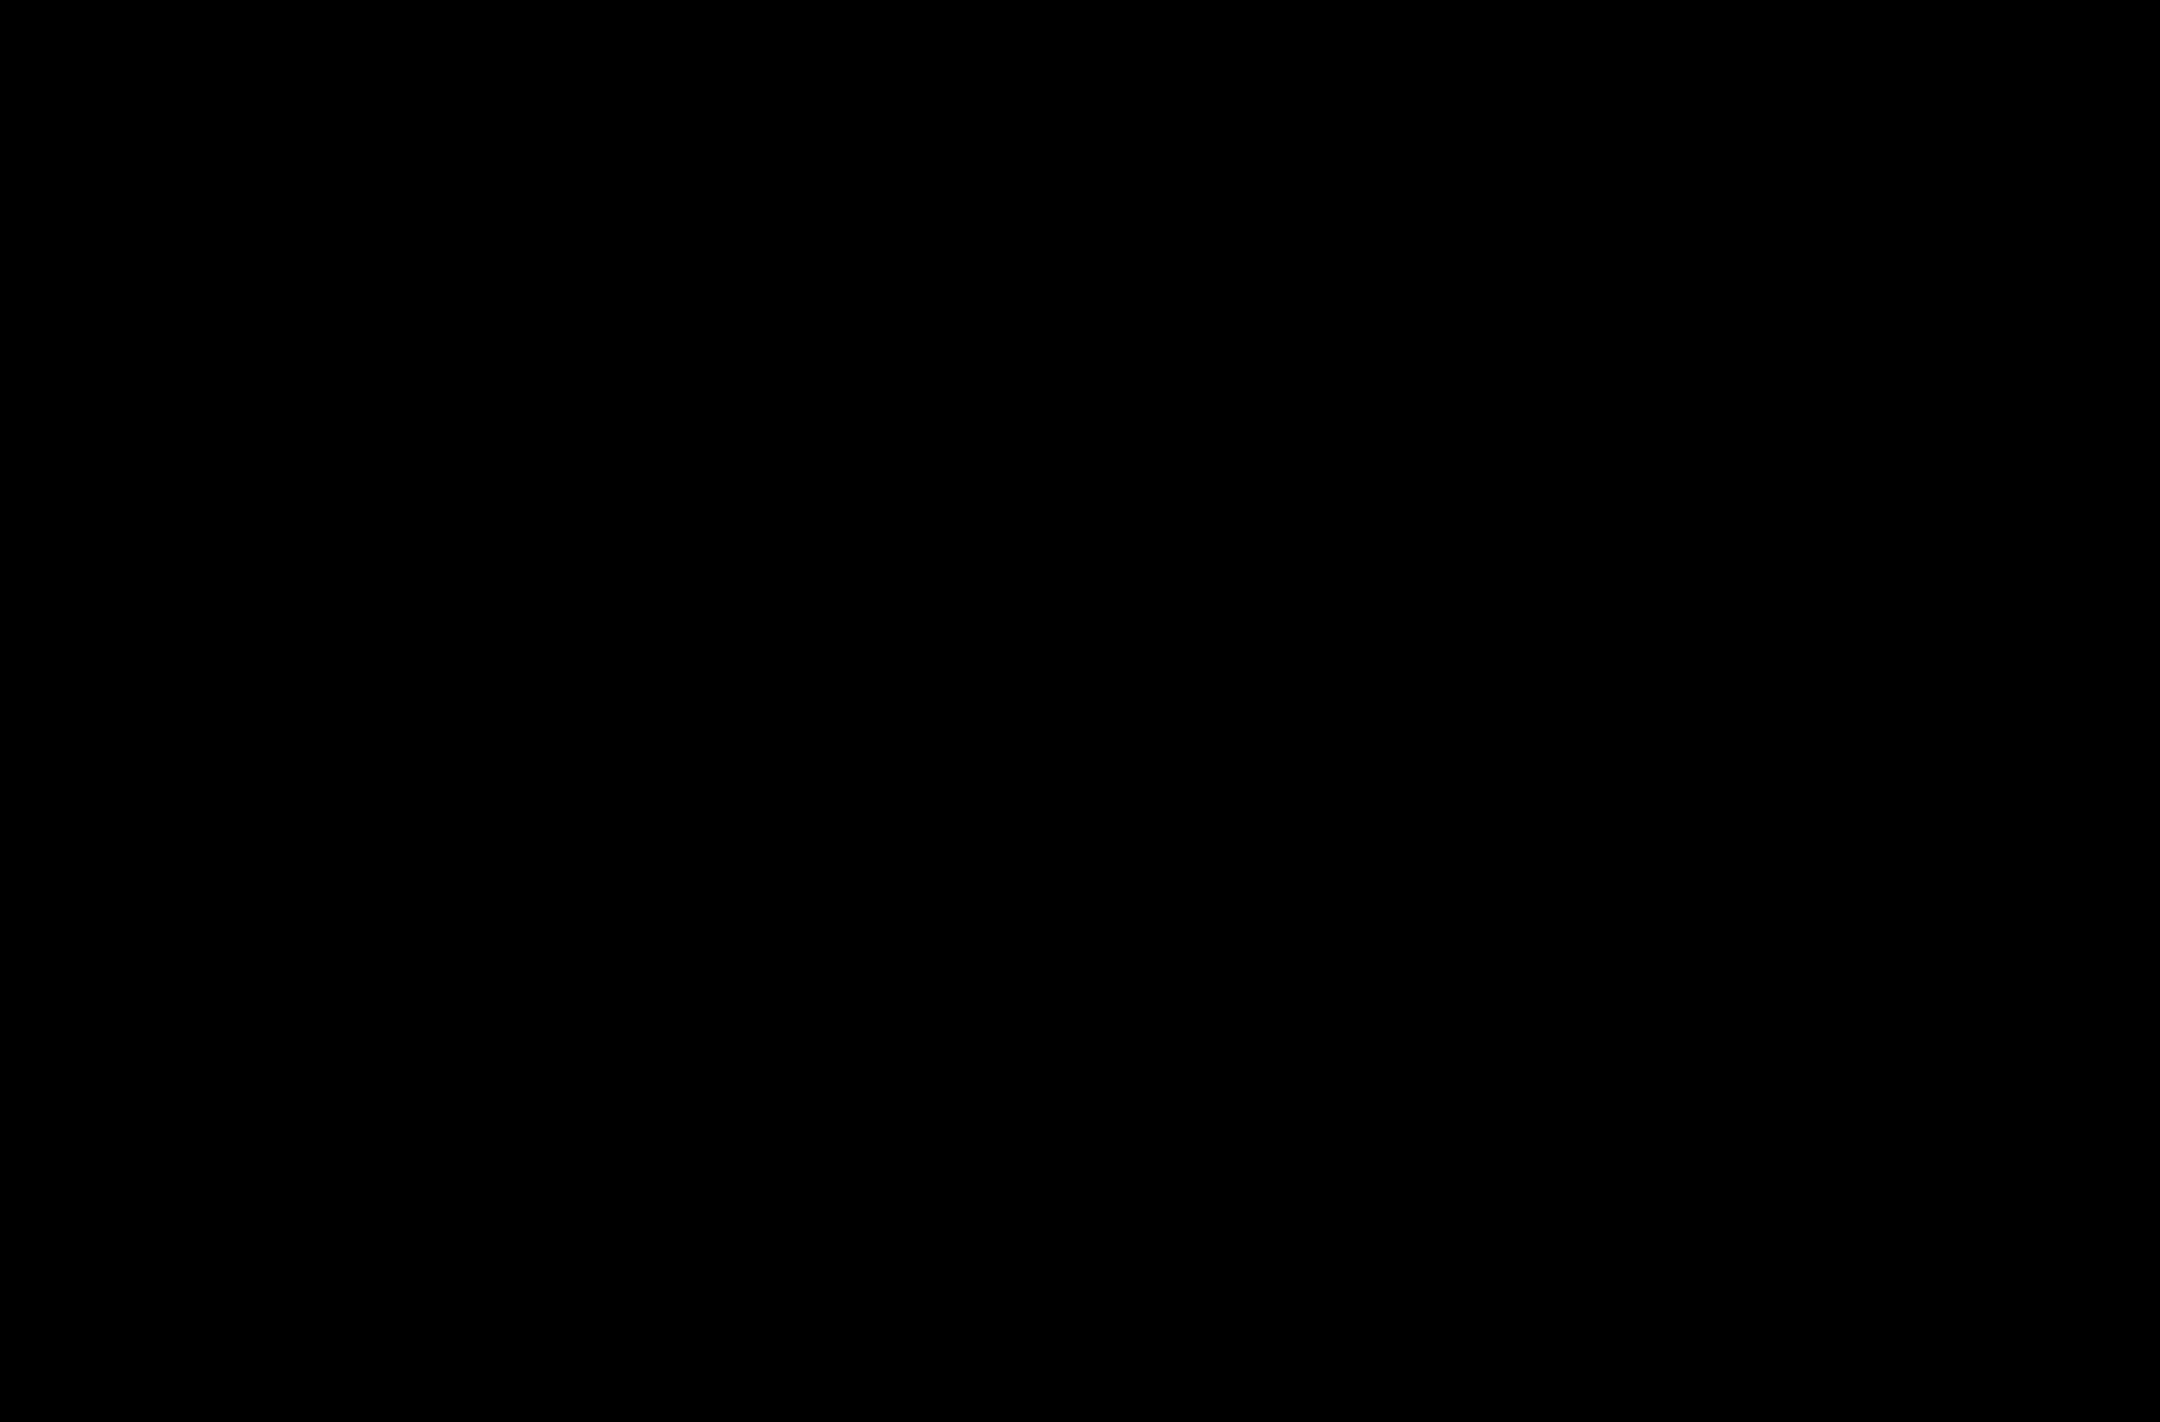 cupra-logo-3